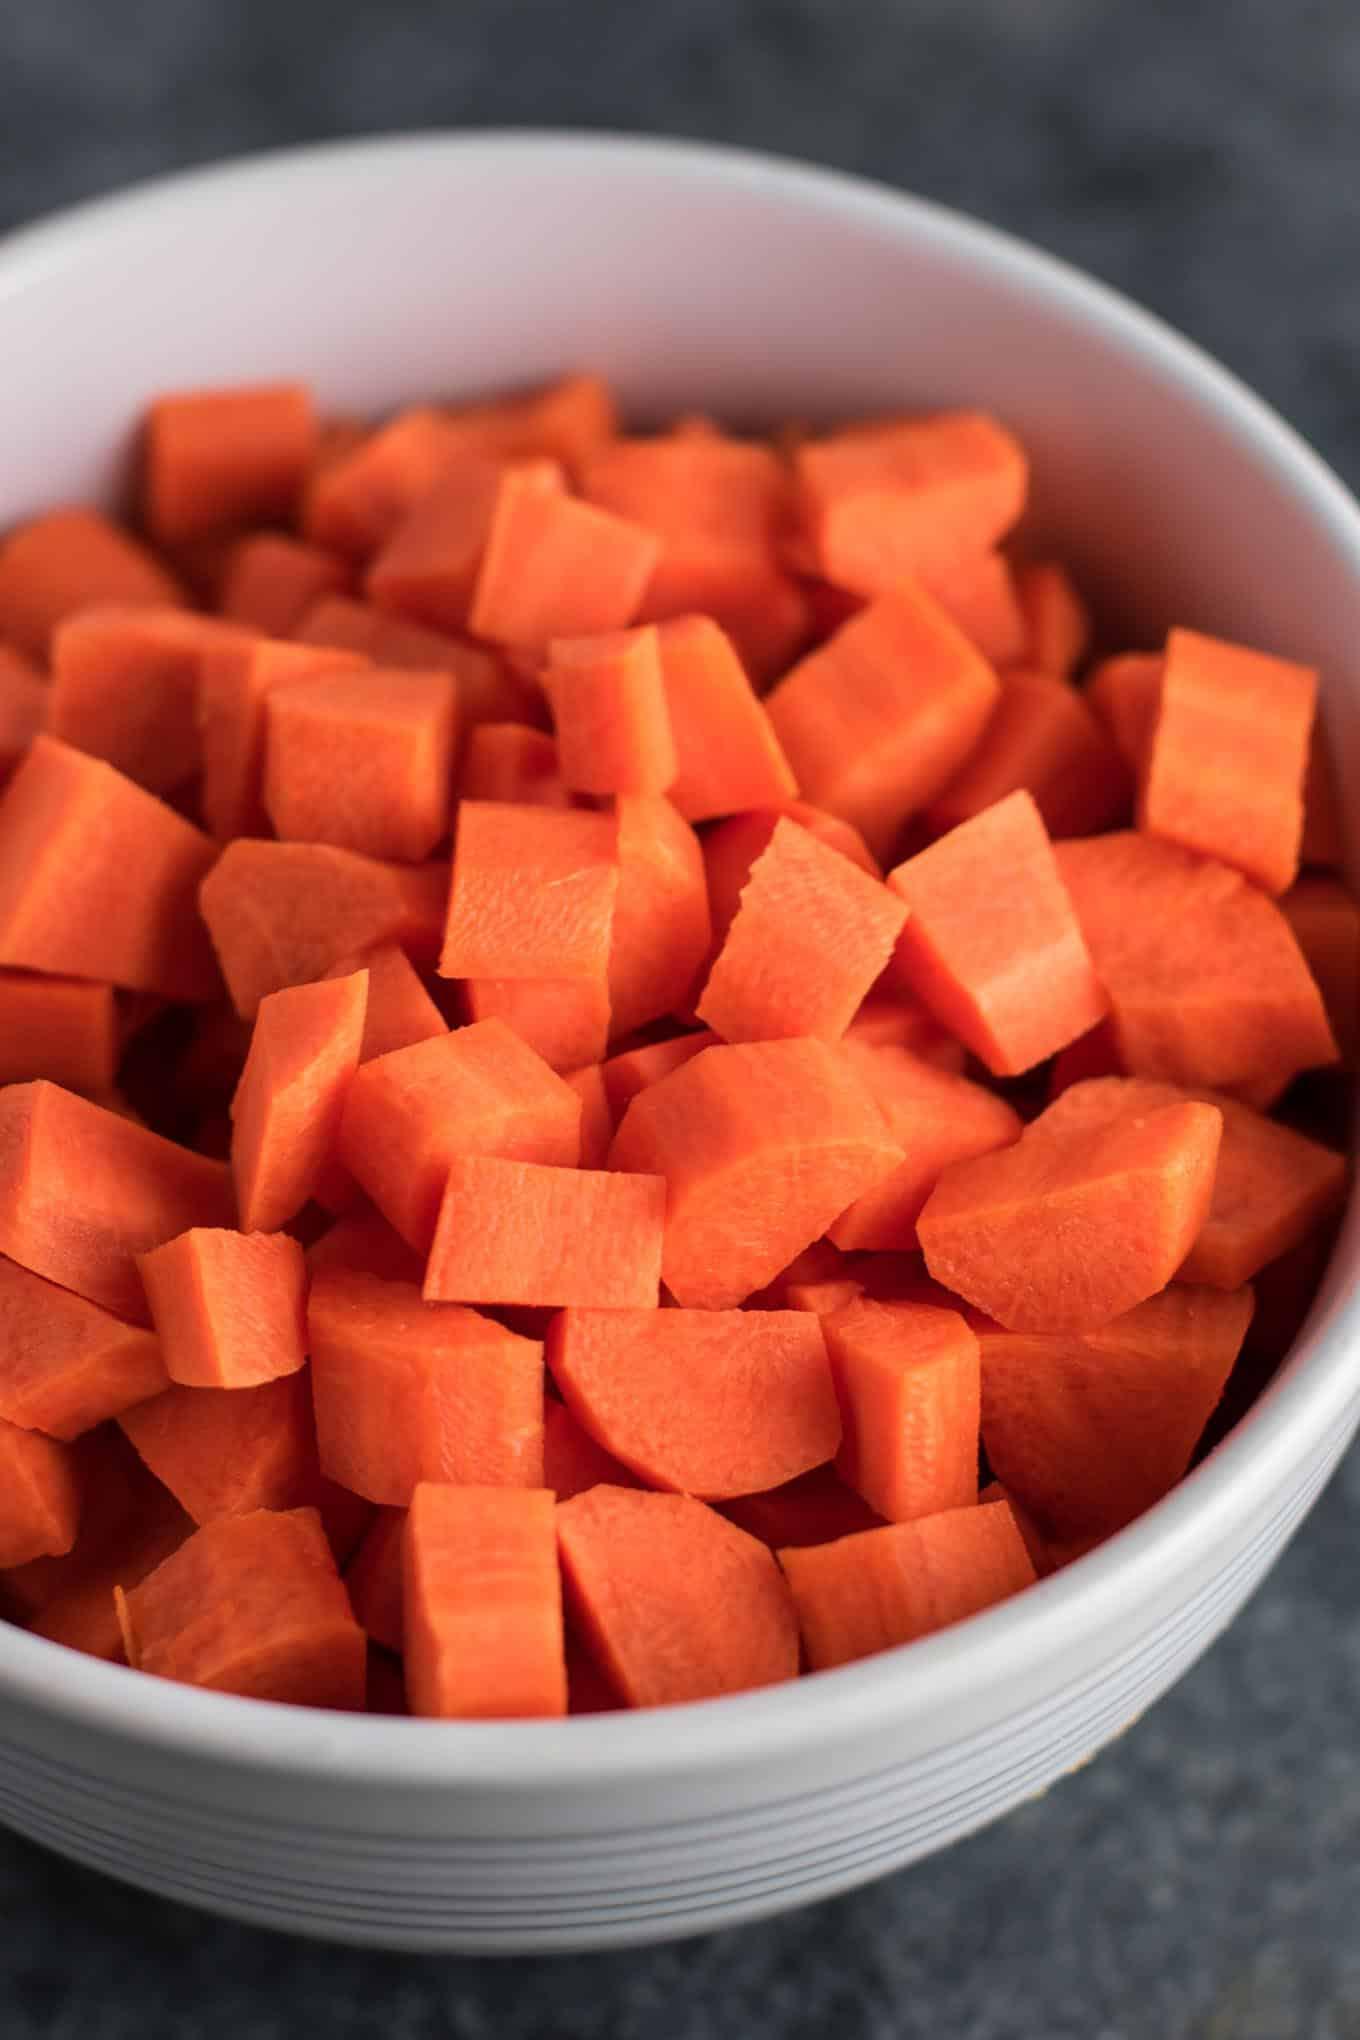 diced carrots